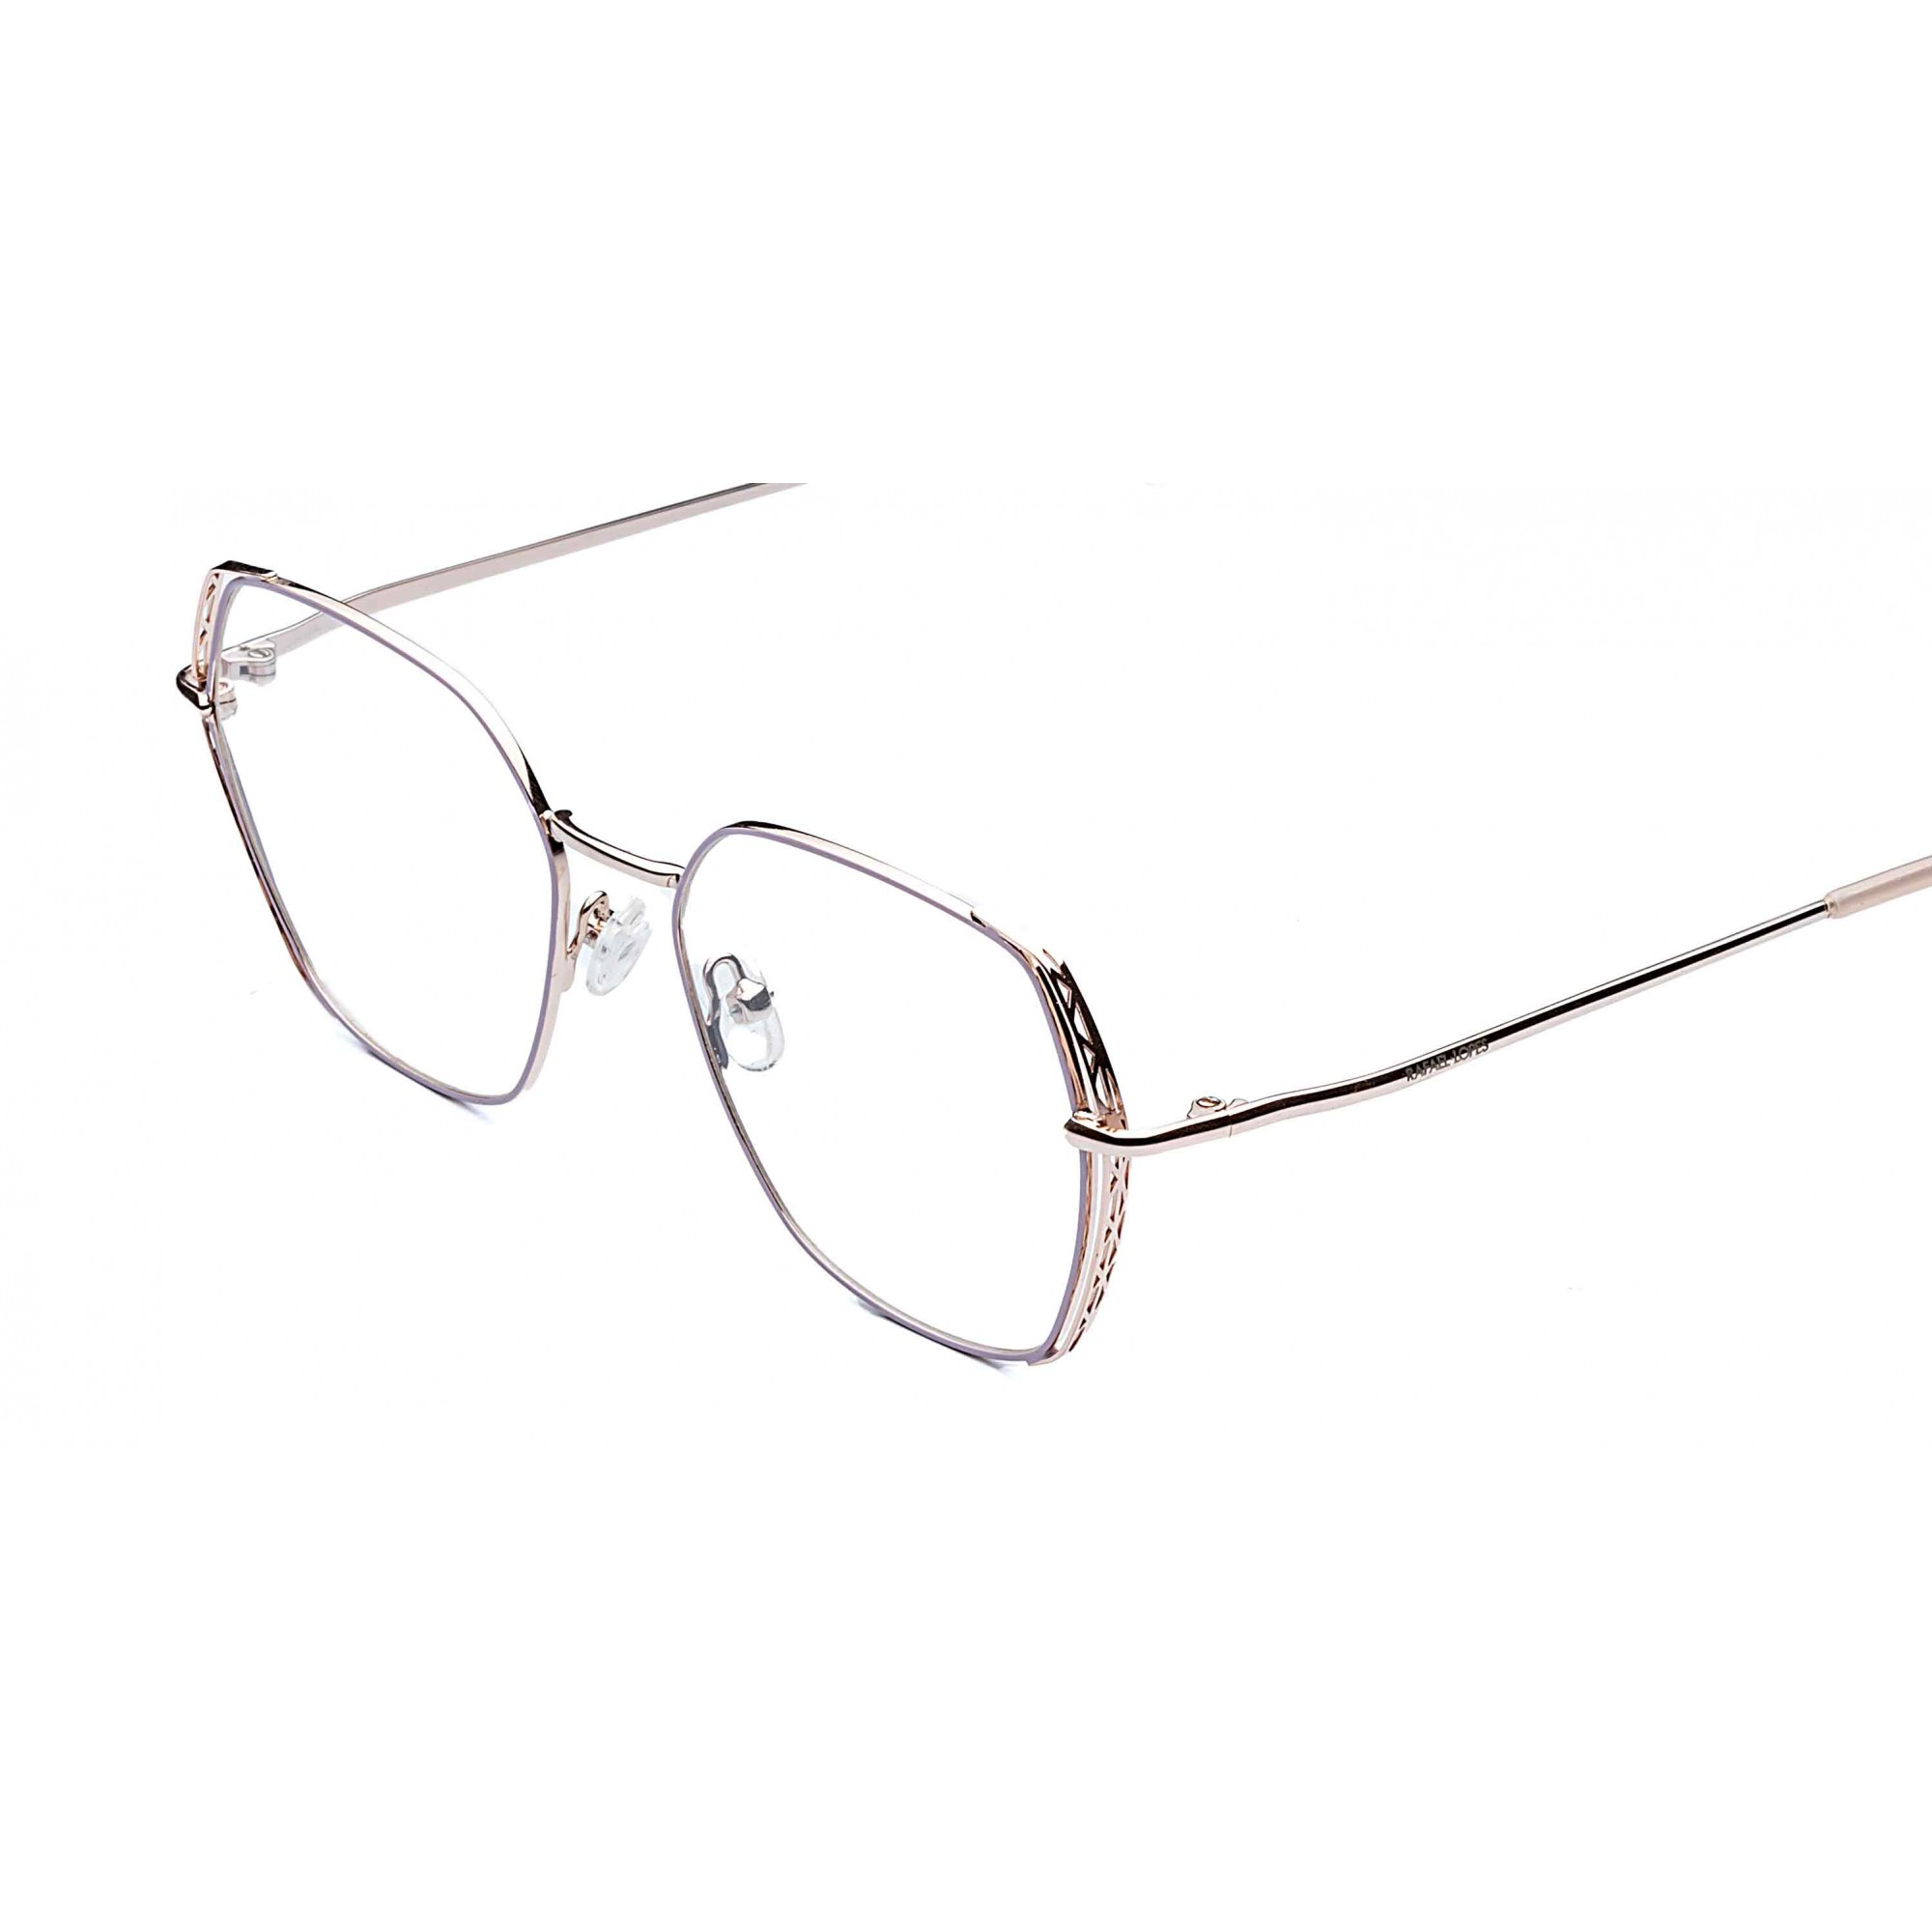 Óculos de Grau Sthefanie Rafael Lopes